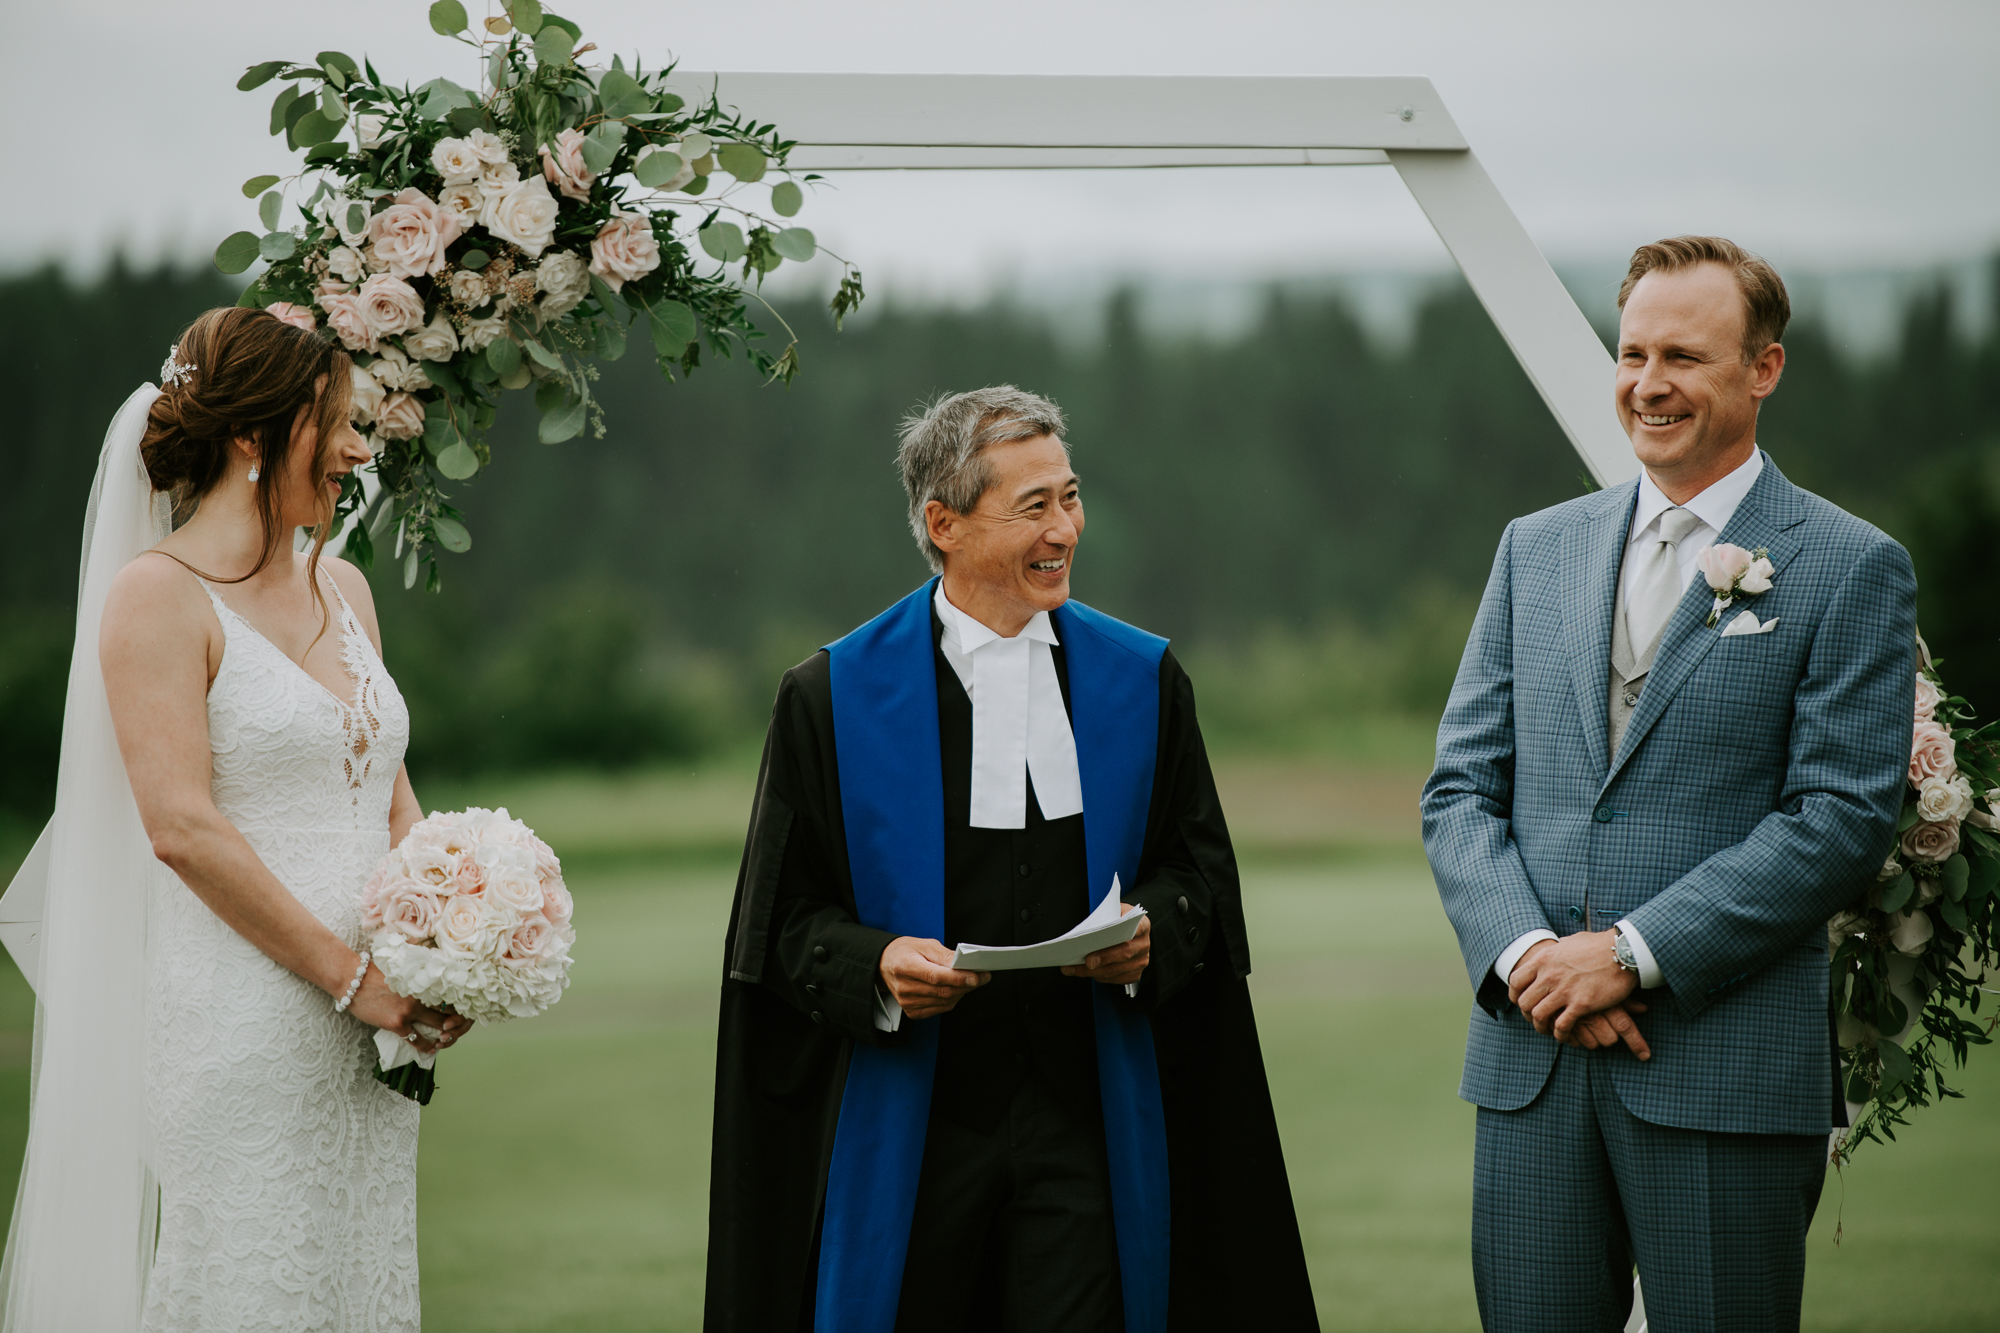 Priddis-Wedding-Photographer-JG-22.jpg